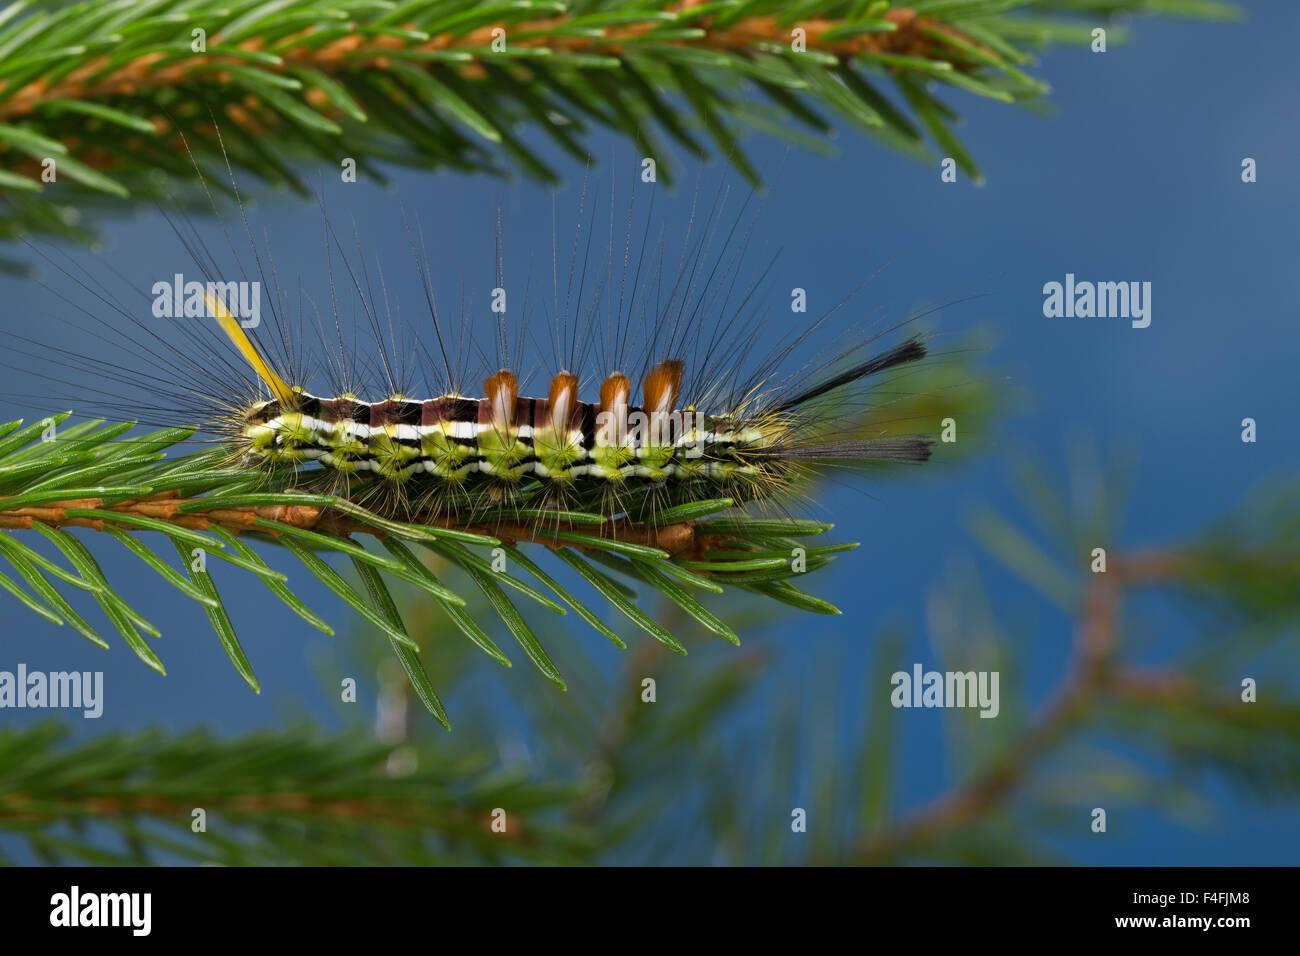 Coniferous tussock moth, caterpillar, Tannen-Streckfuß, Raupe, Tannen-Streckfuss, Tannenstreckfuß, Calliteara - Stock Image